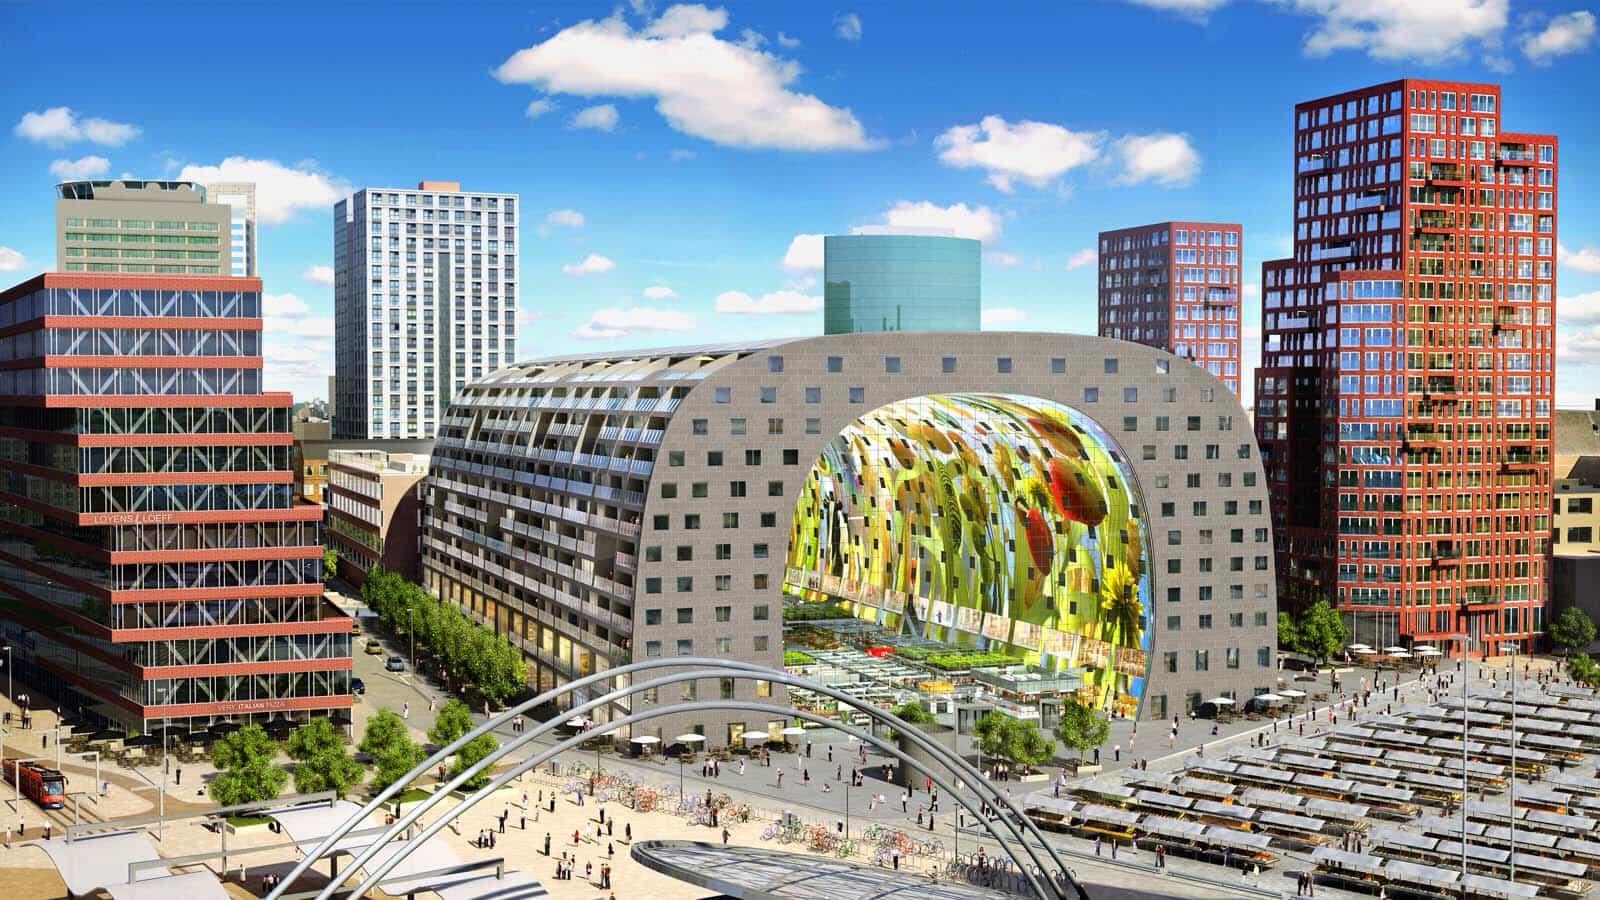 De Markthal In Rotterdam Travel Rumors